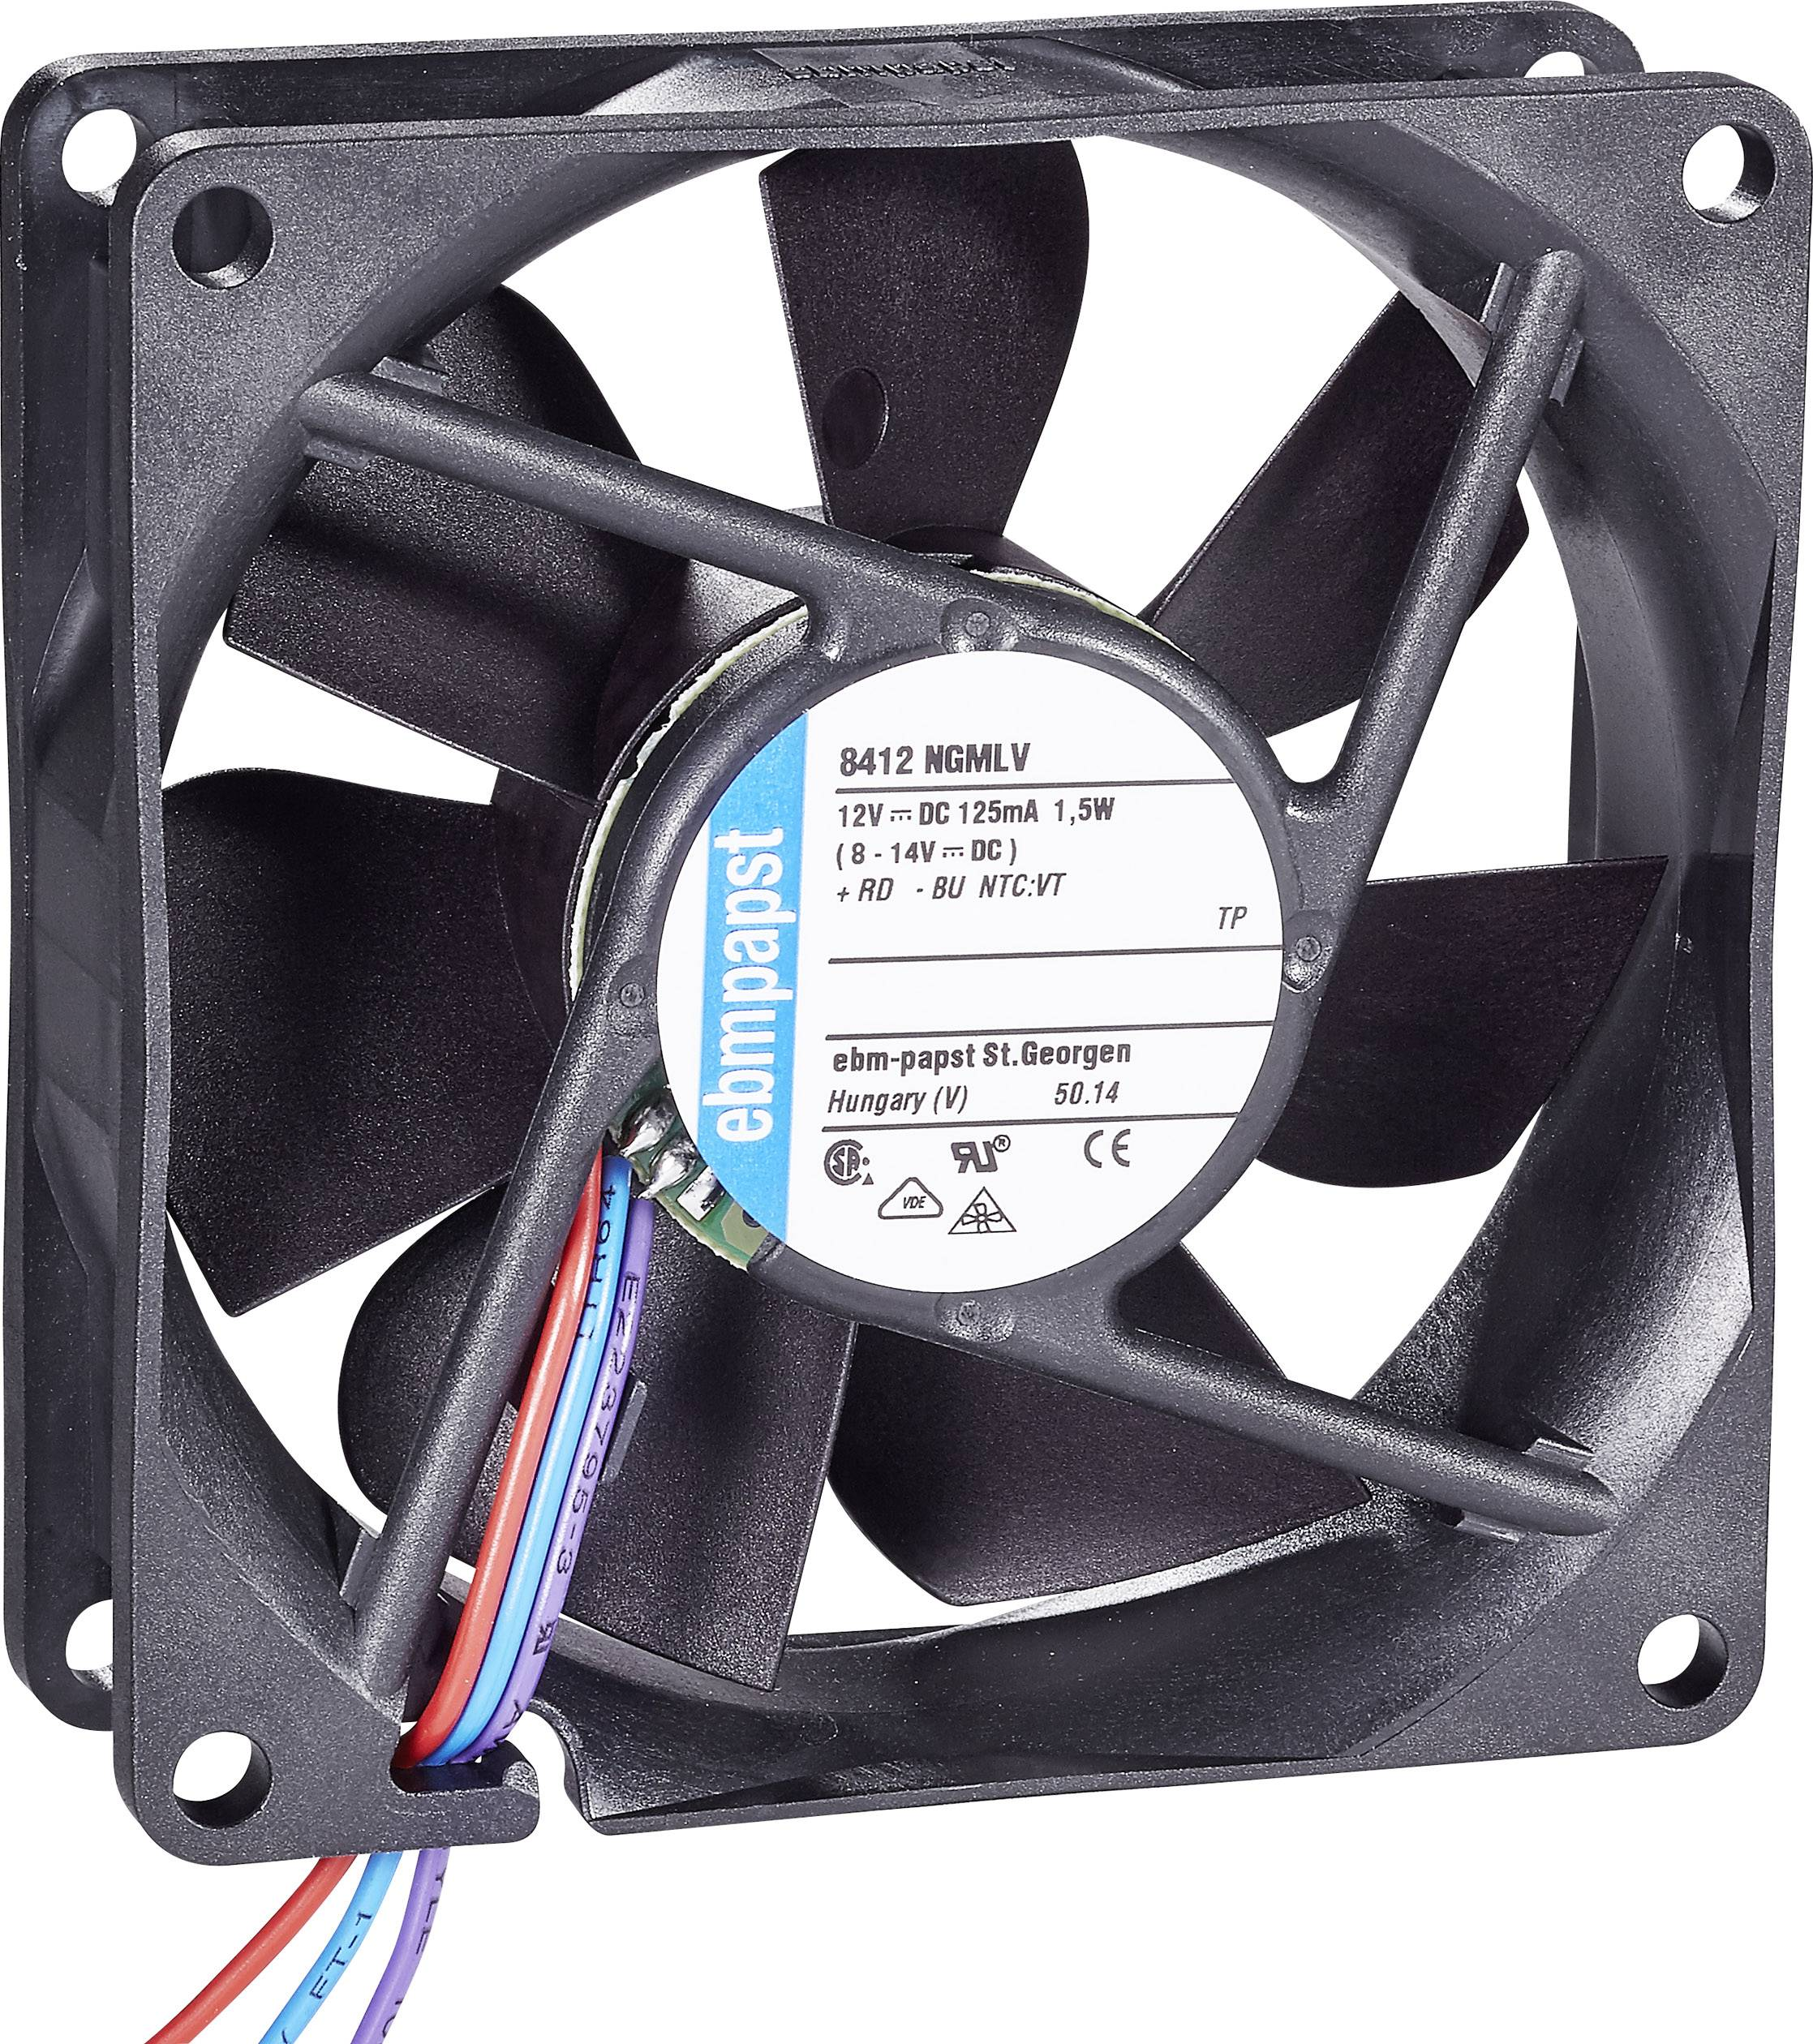 Axiálny ventilátor EBM Papst Vario-Fan, 8412 NG, 10 - 19 dBA